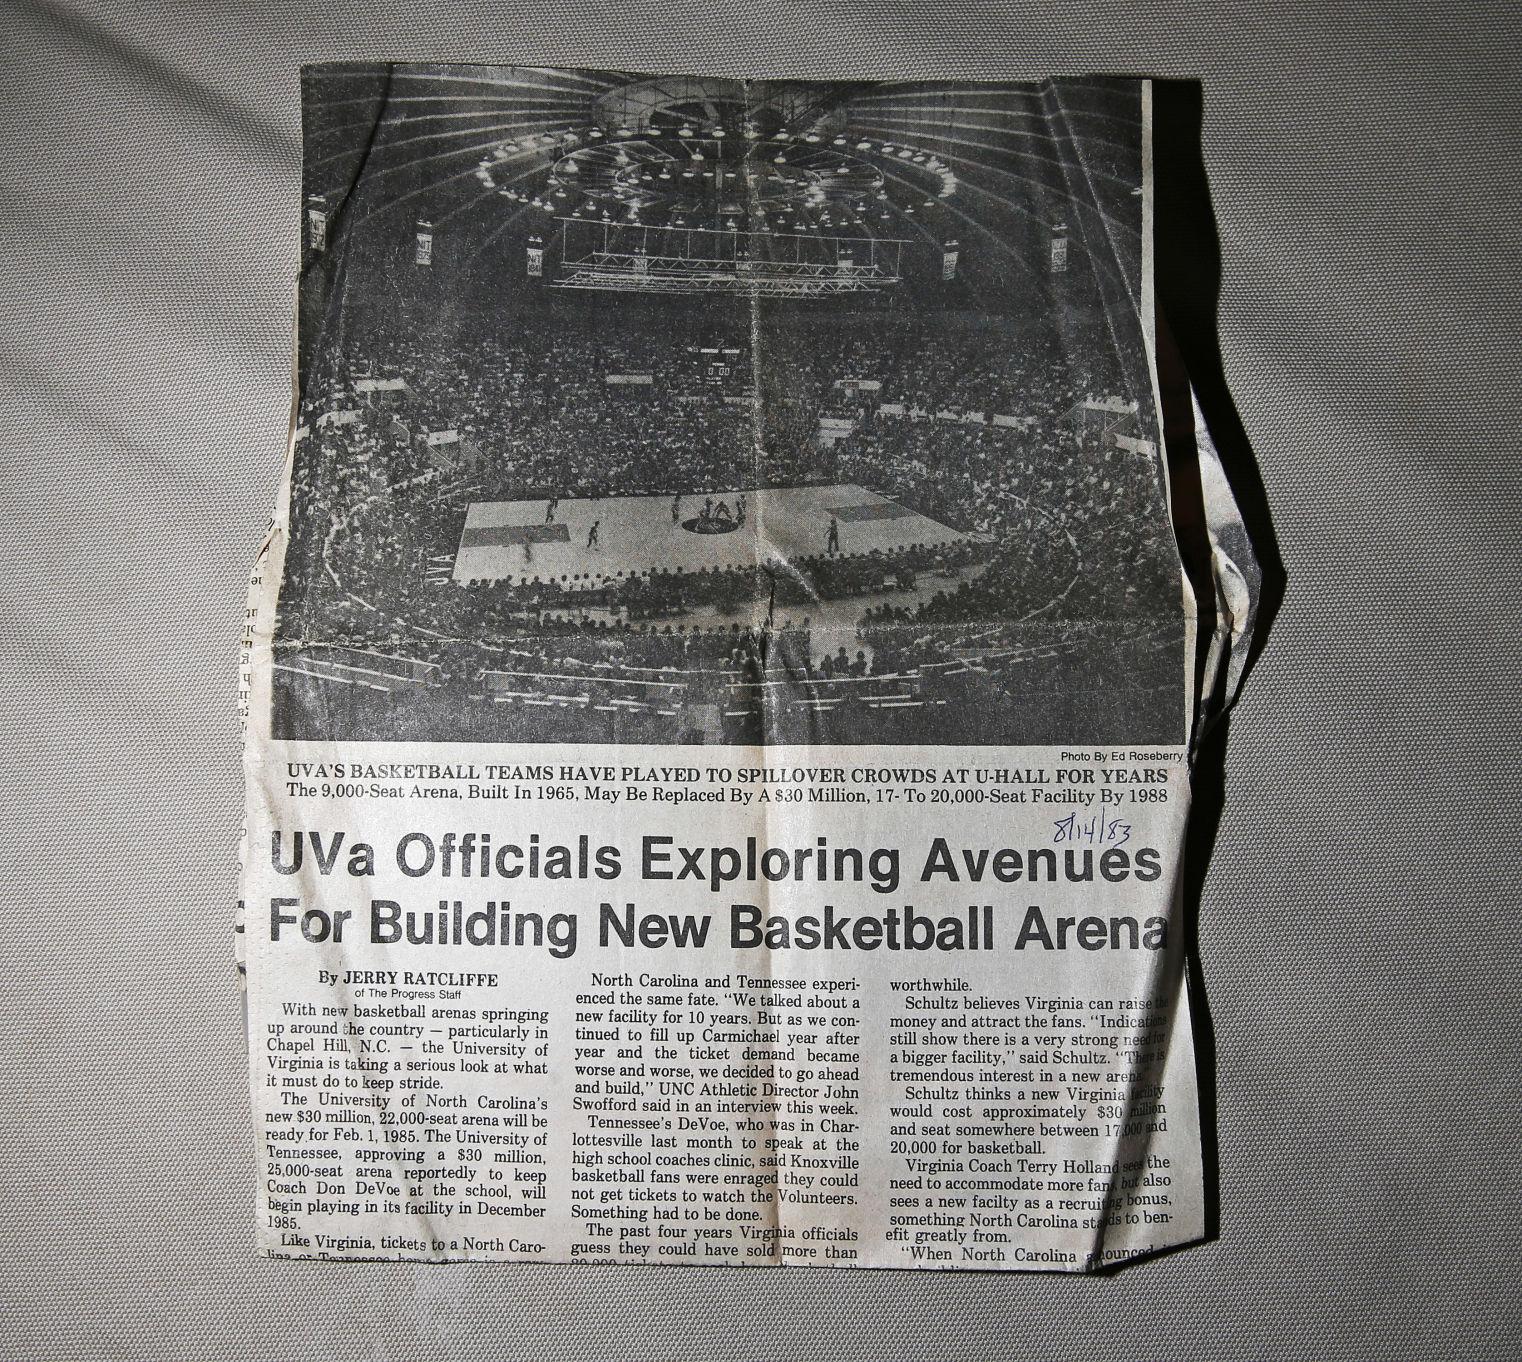 1983 Progress article